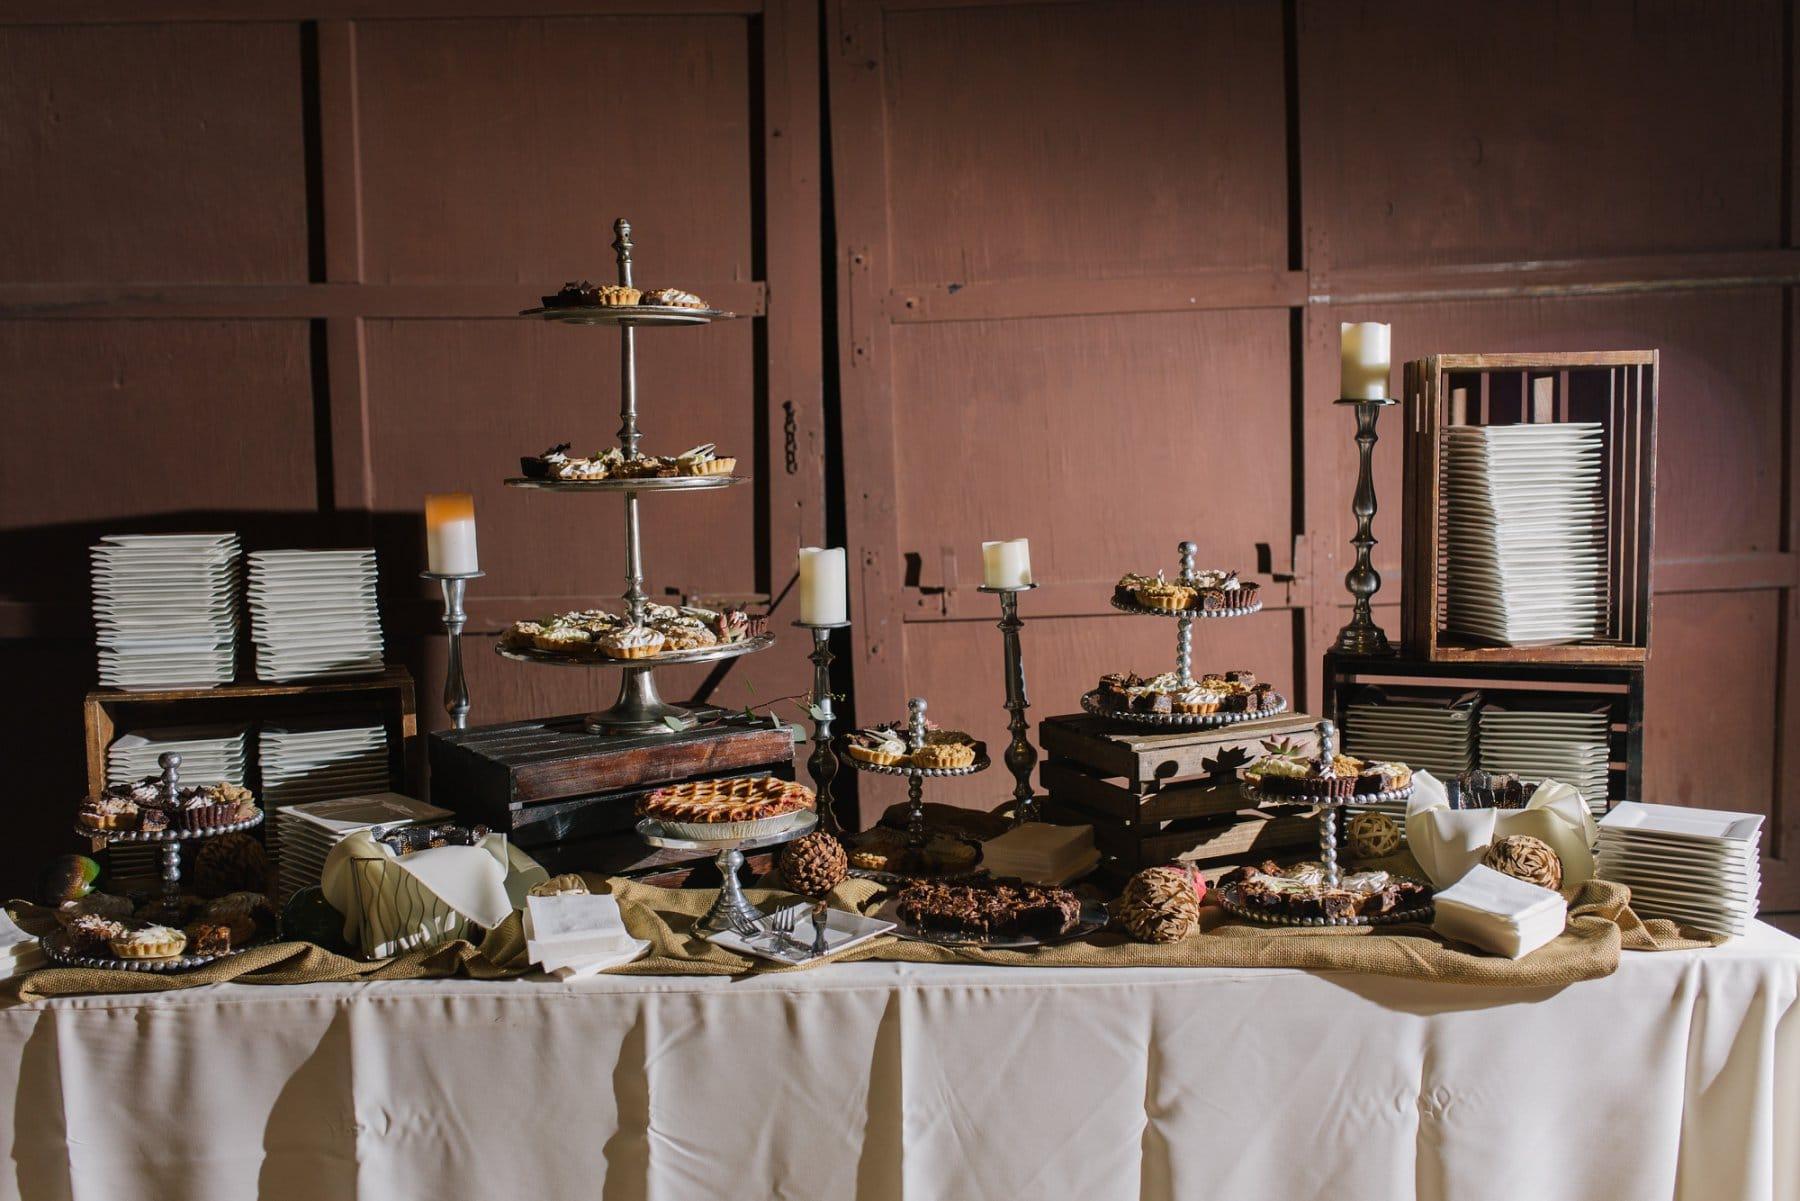 Desert Foothills barn wedding dessert table with pie